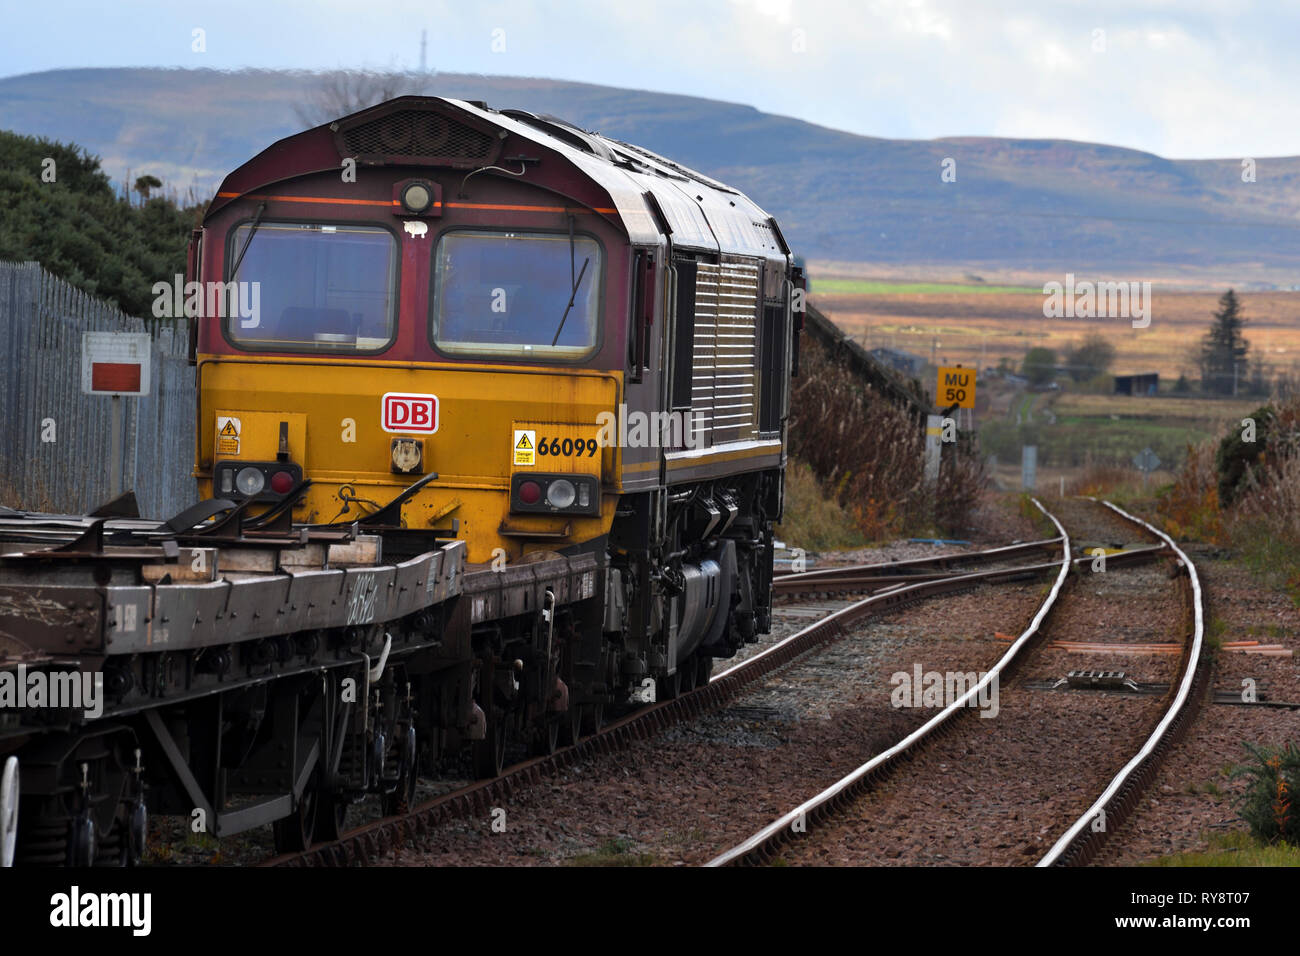 class 66;diesel locomotive;georgemas junction;caithness;scotland - Stock Image